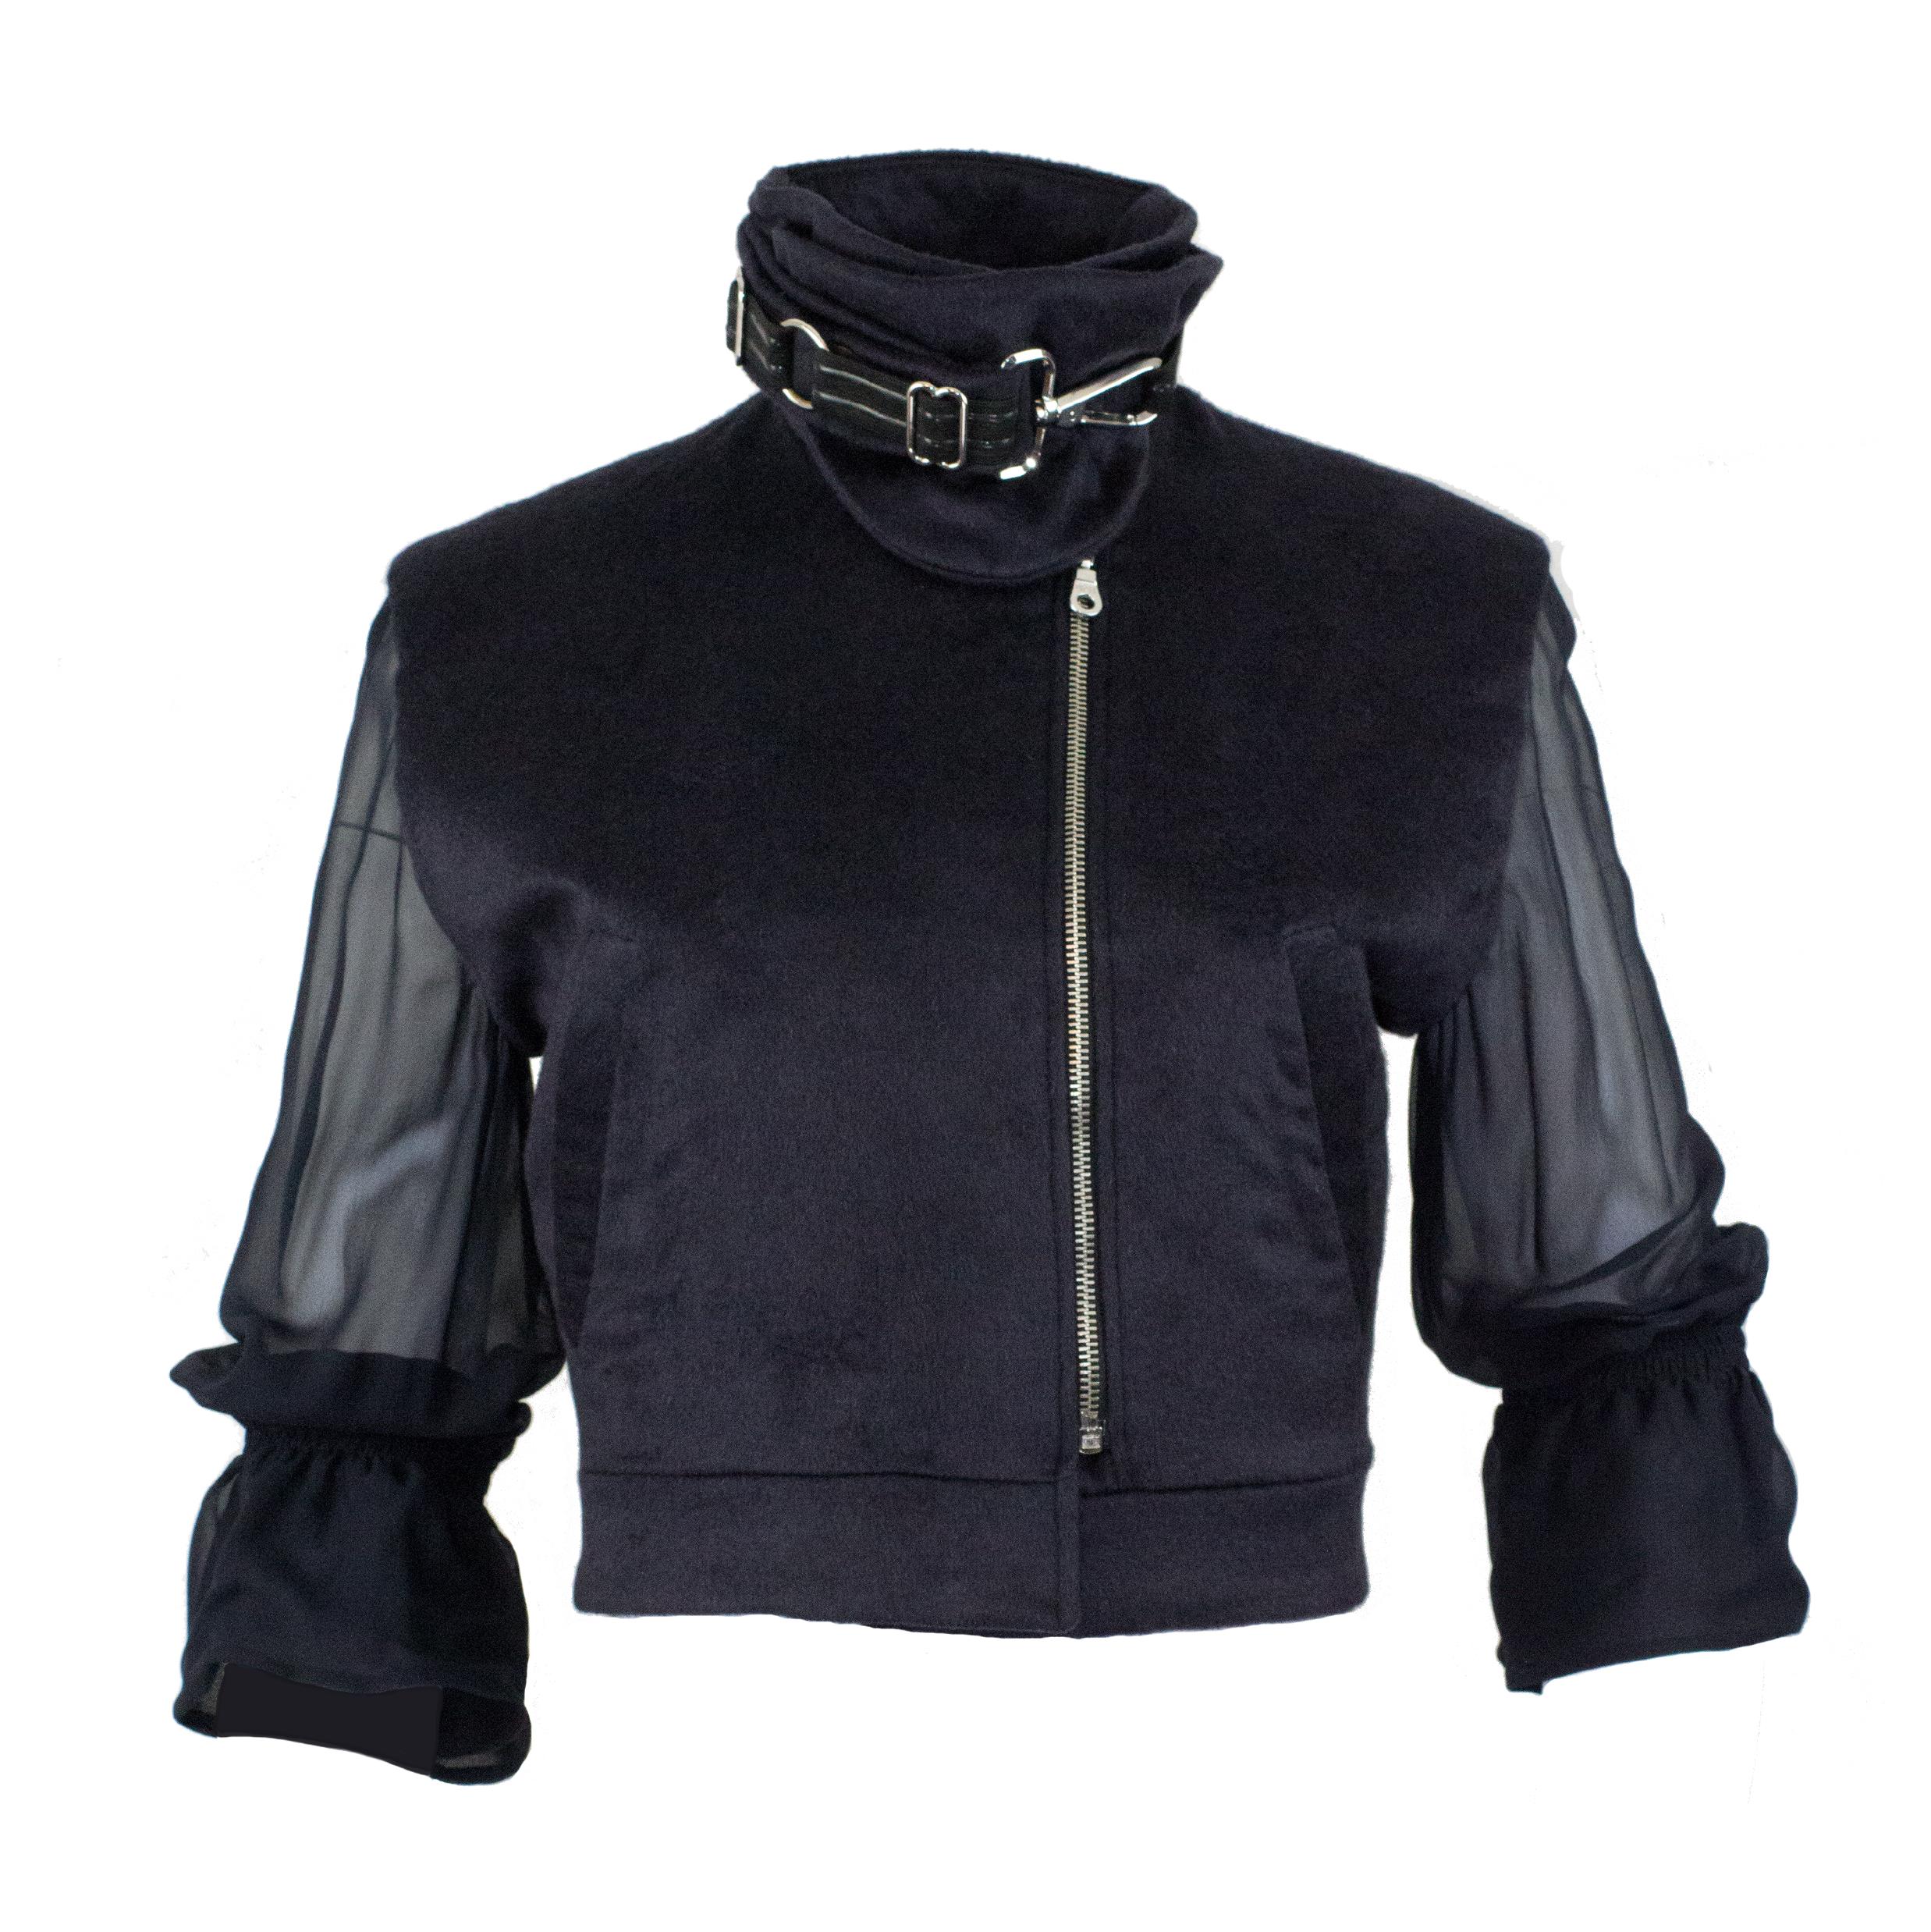 front-jacket-jacke Kopie.jpg